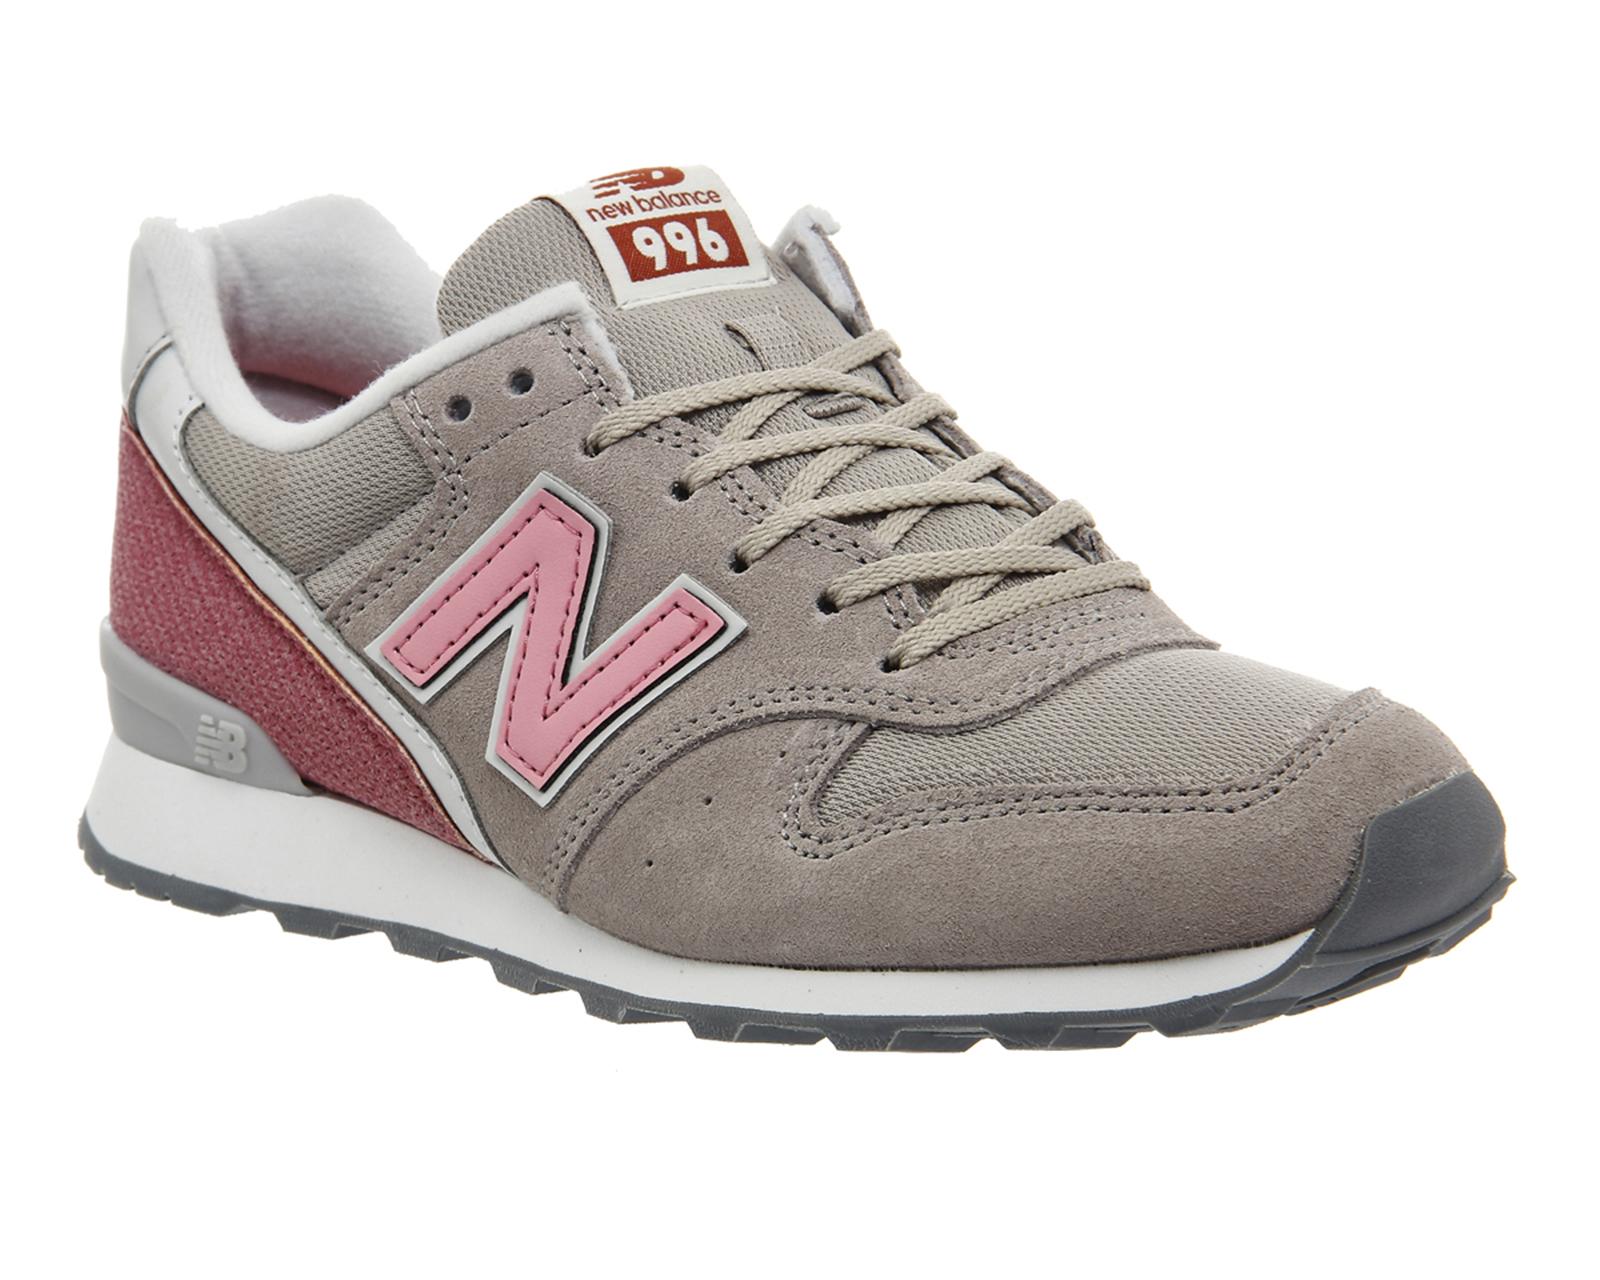 new balance wr996 zapatillas beige rosa zapatillas zapatos. Black Bedroom Furniture Sets. Home Design Ideas